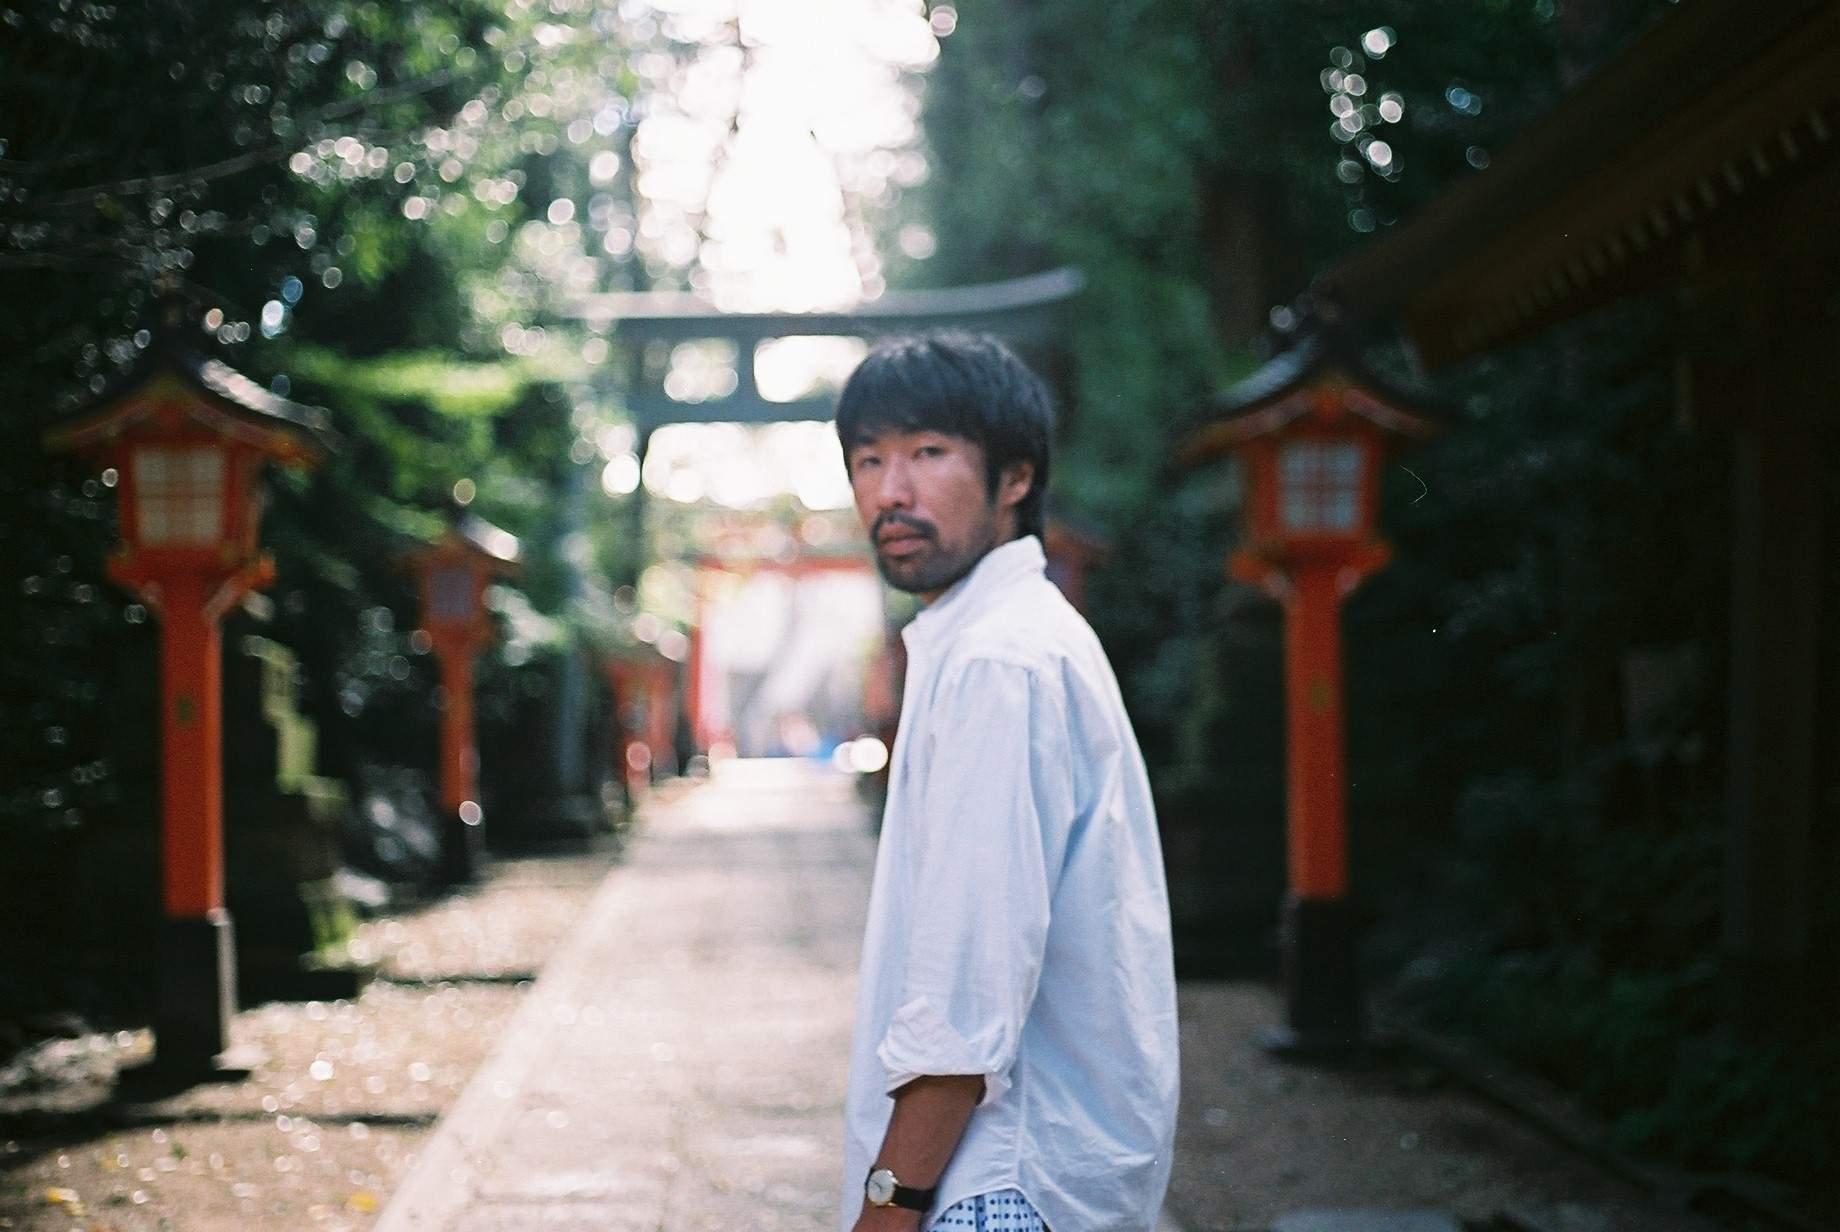 http://rose-records.jp/files/20190126125556.jpg